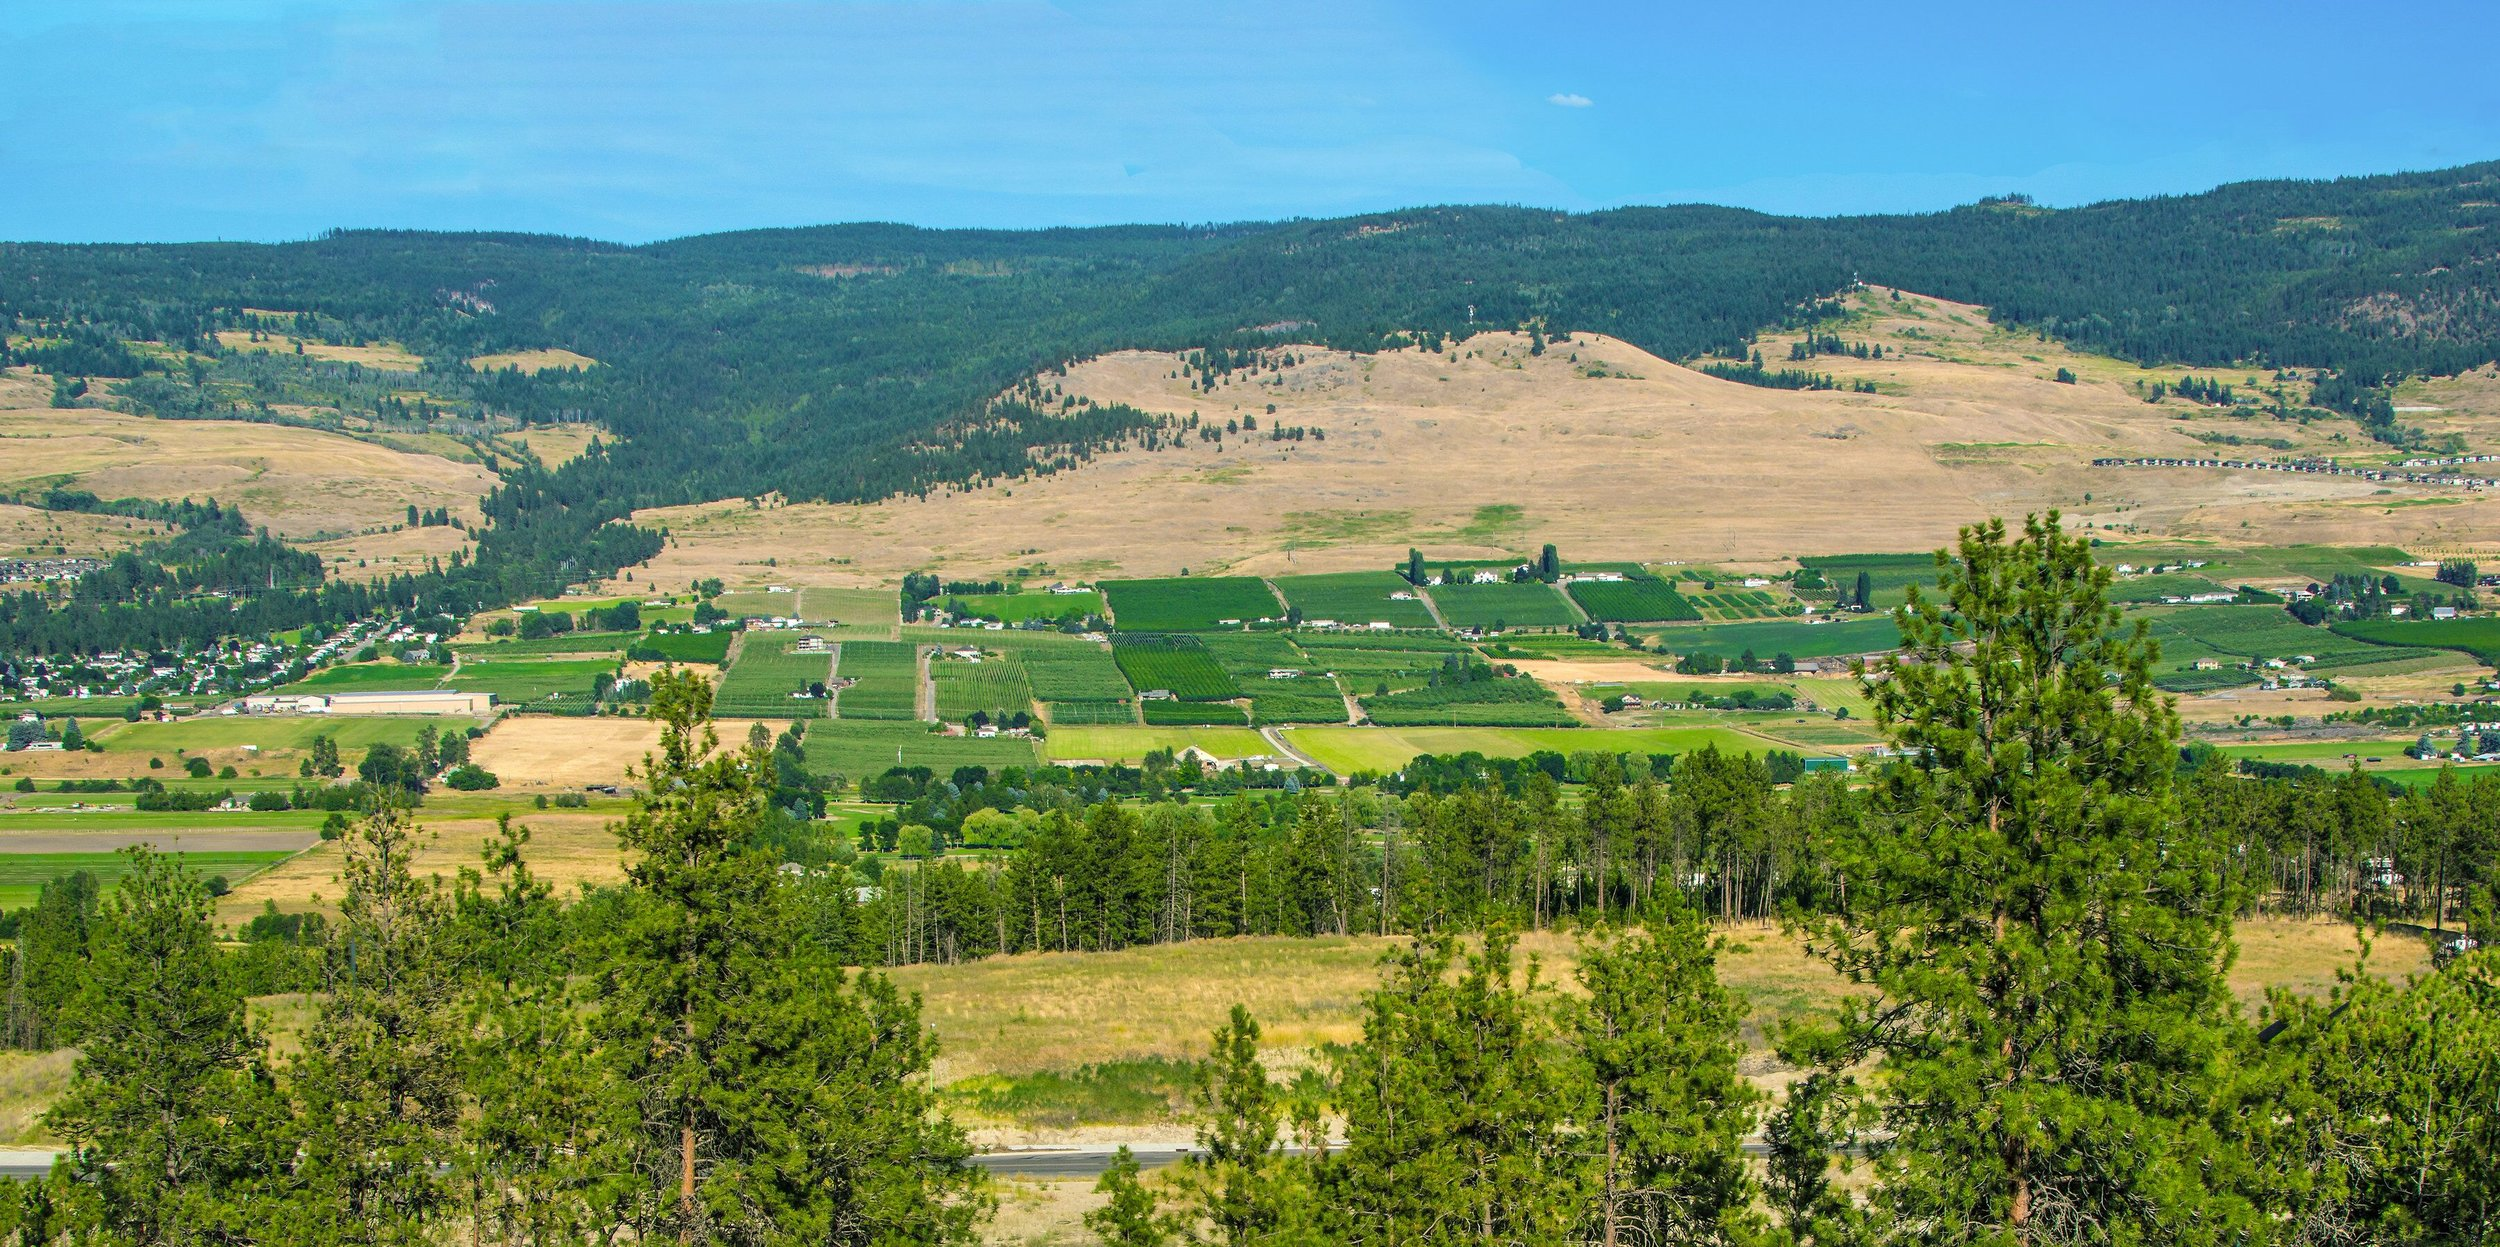 Views of the Okanagan from University Heights